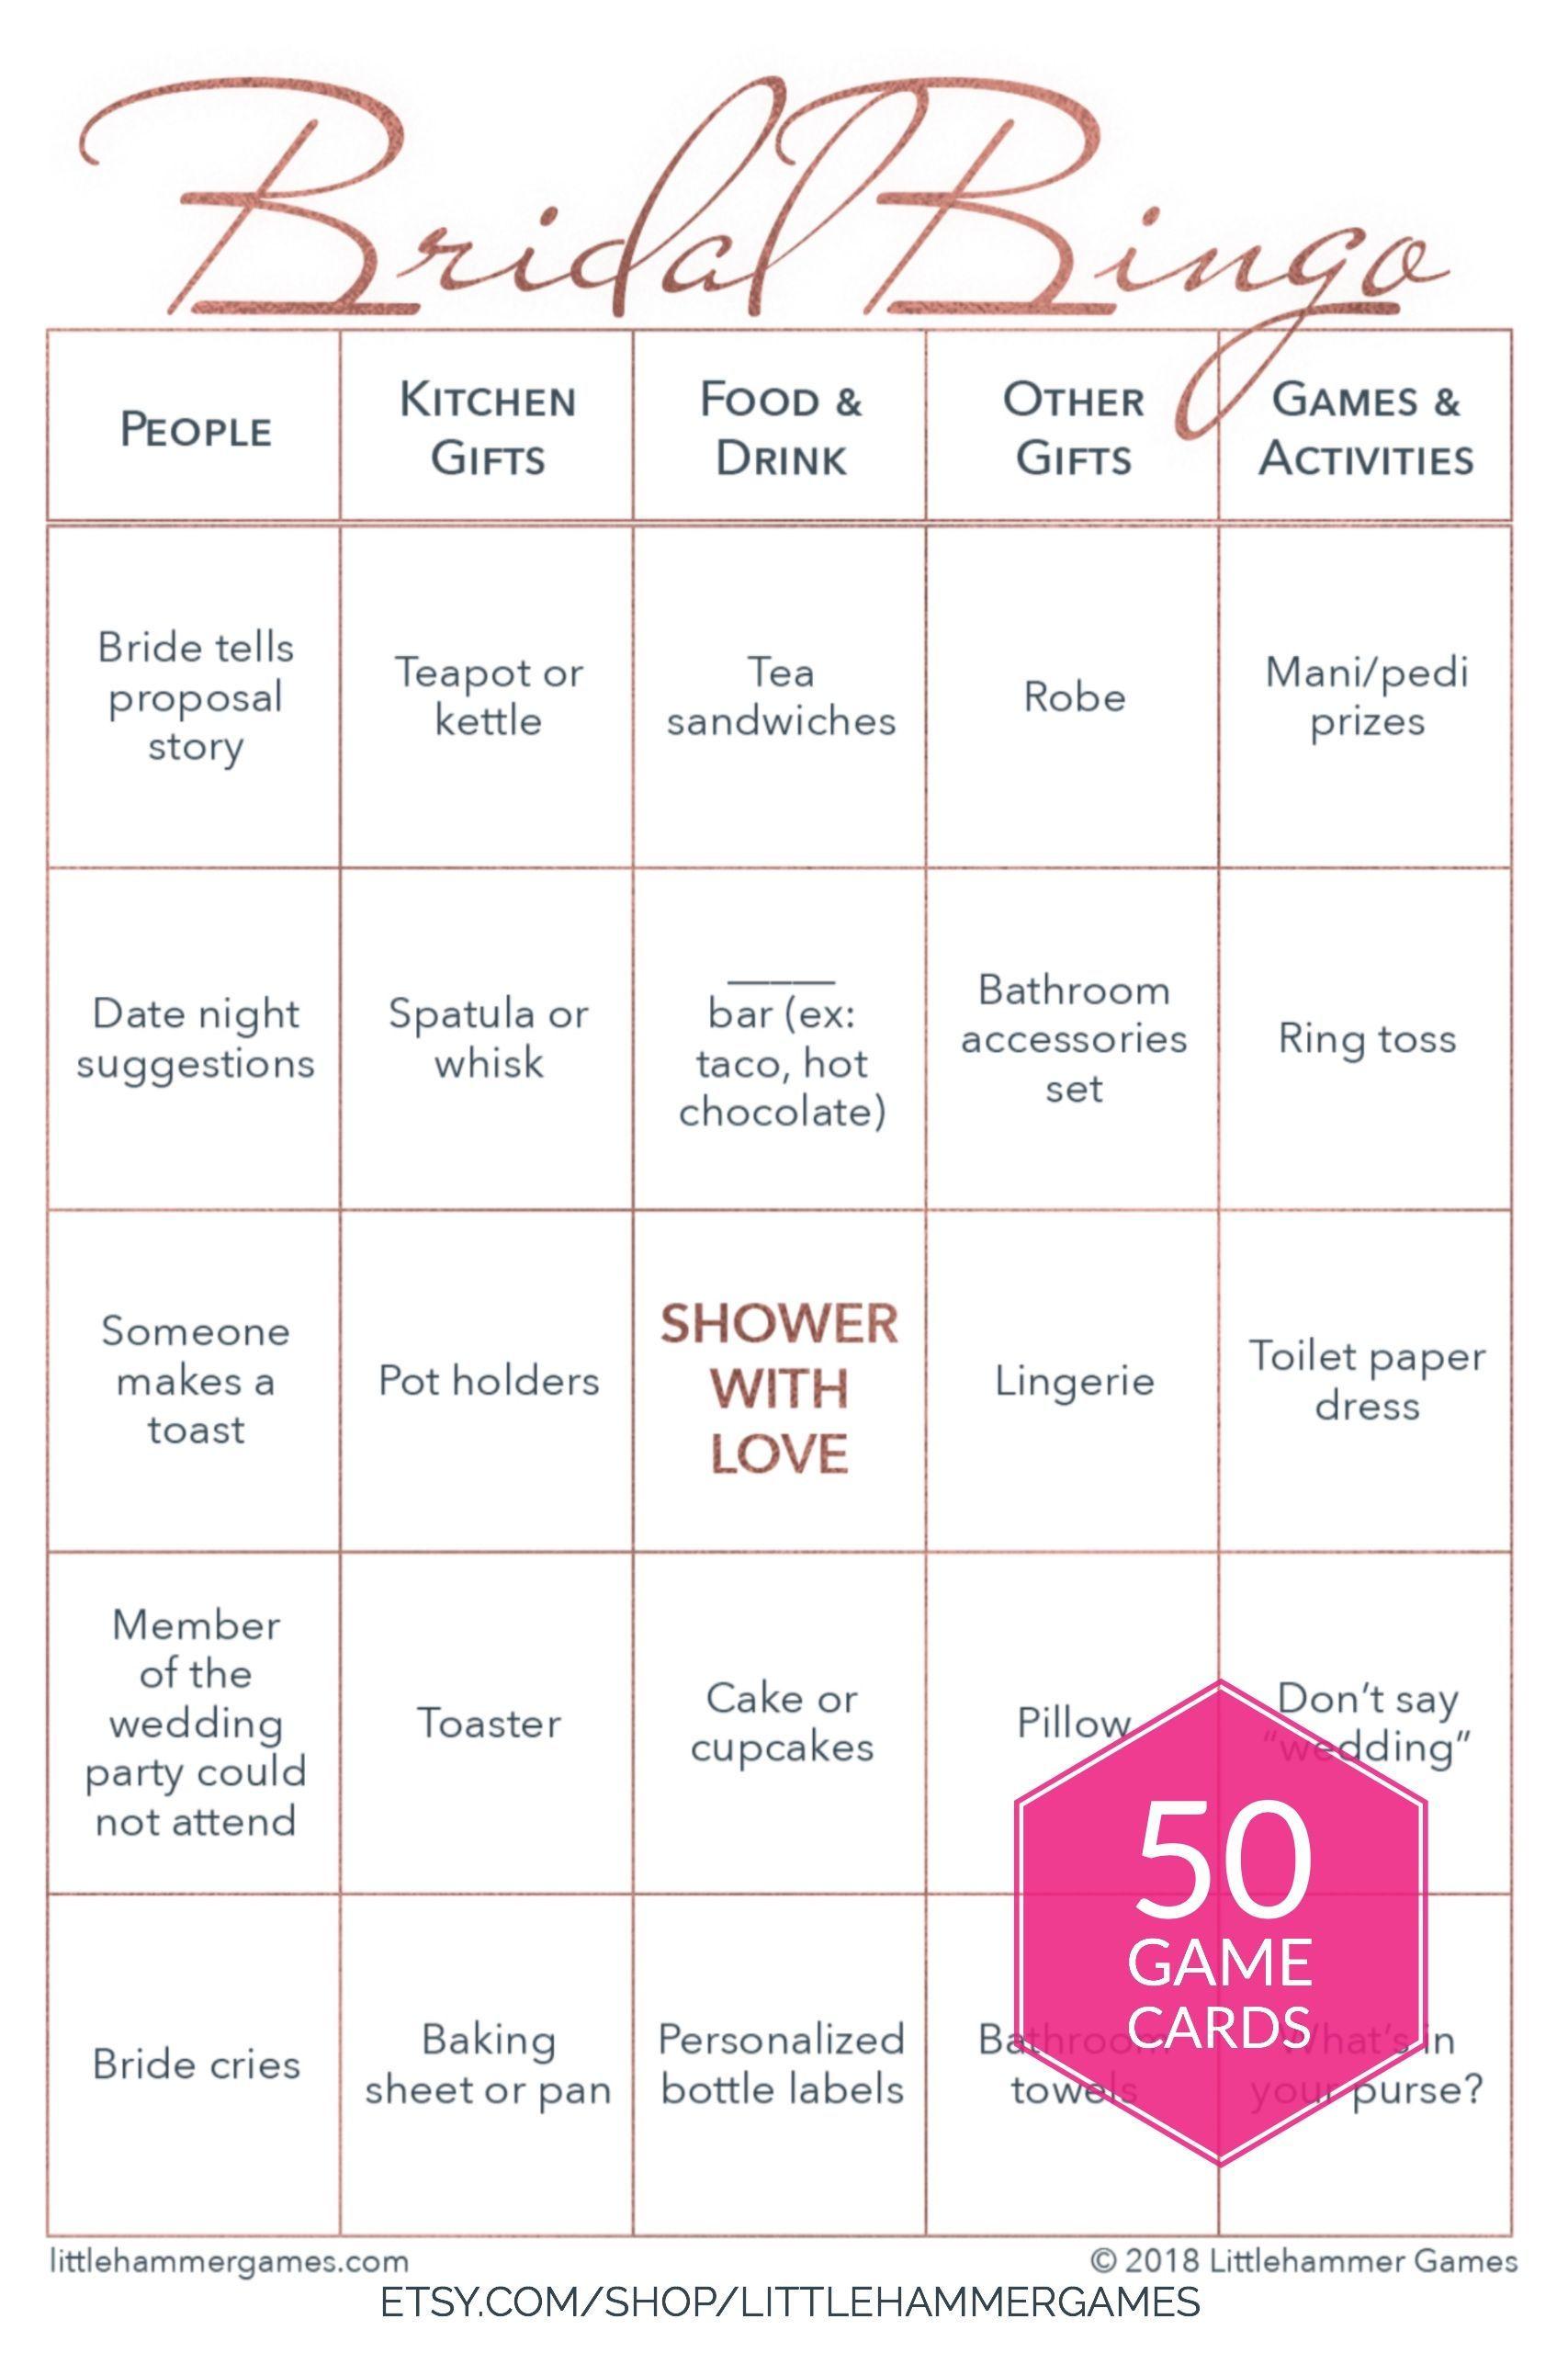 fun printable bridal shower game bridal bingo in a rose gold geometric design that can